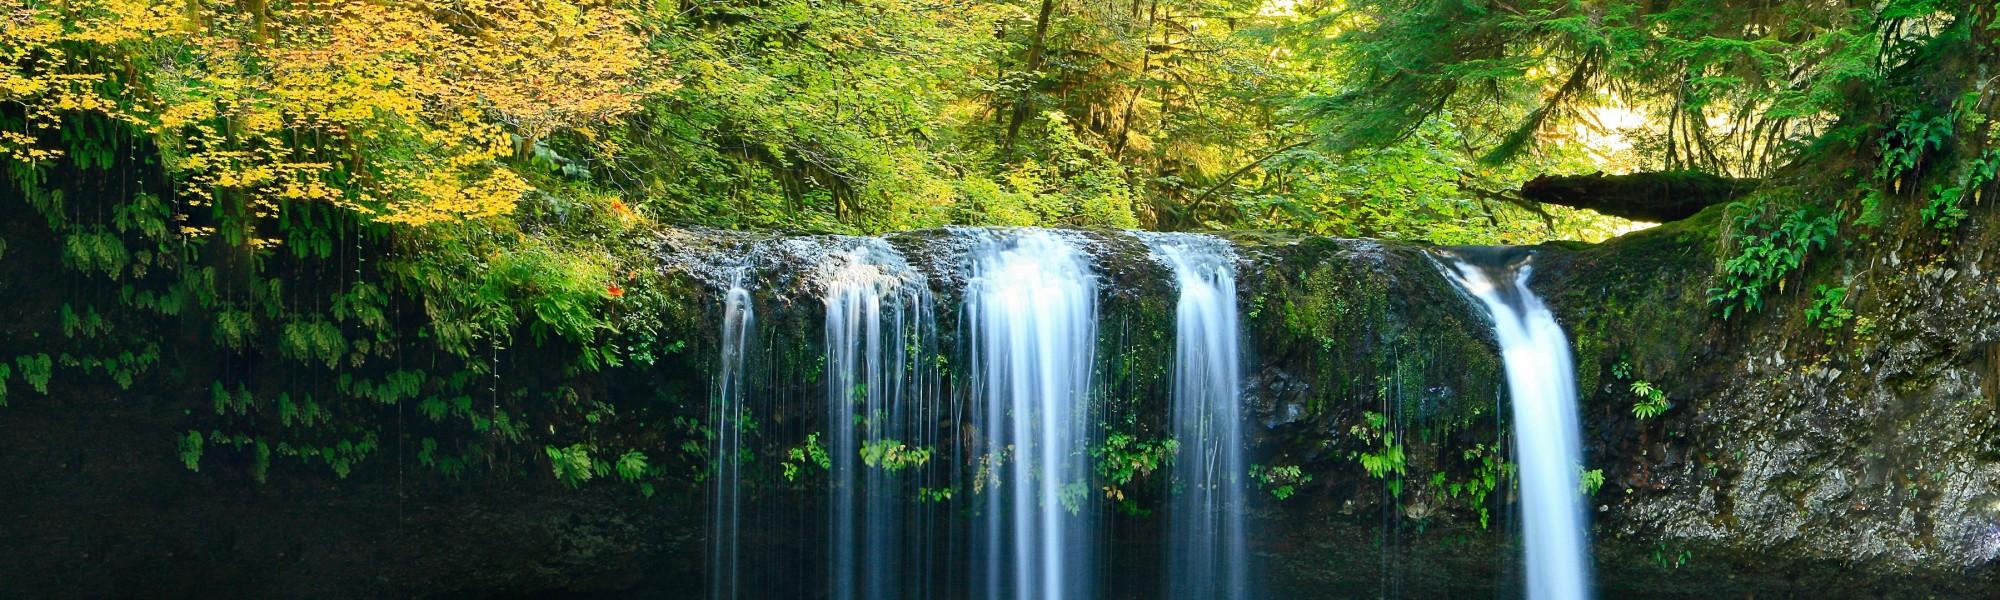 jeffrey-workman-19042-unsplash Wasserfall 1